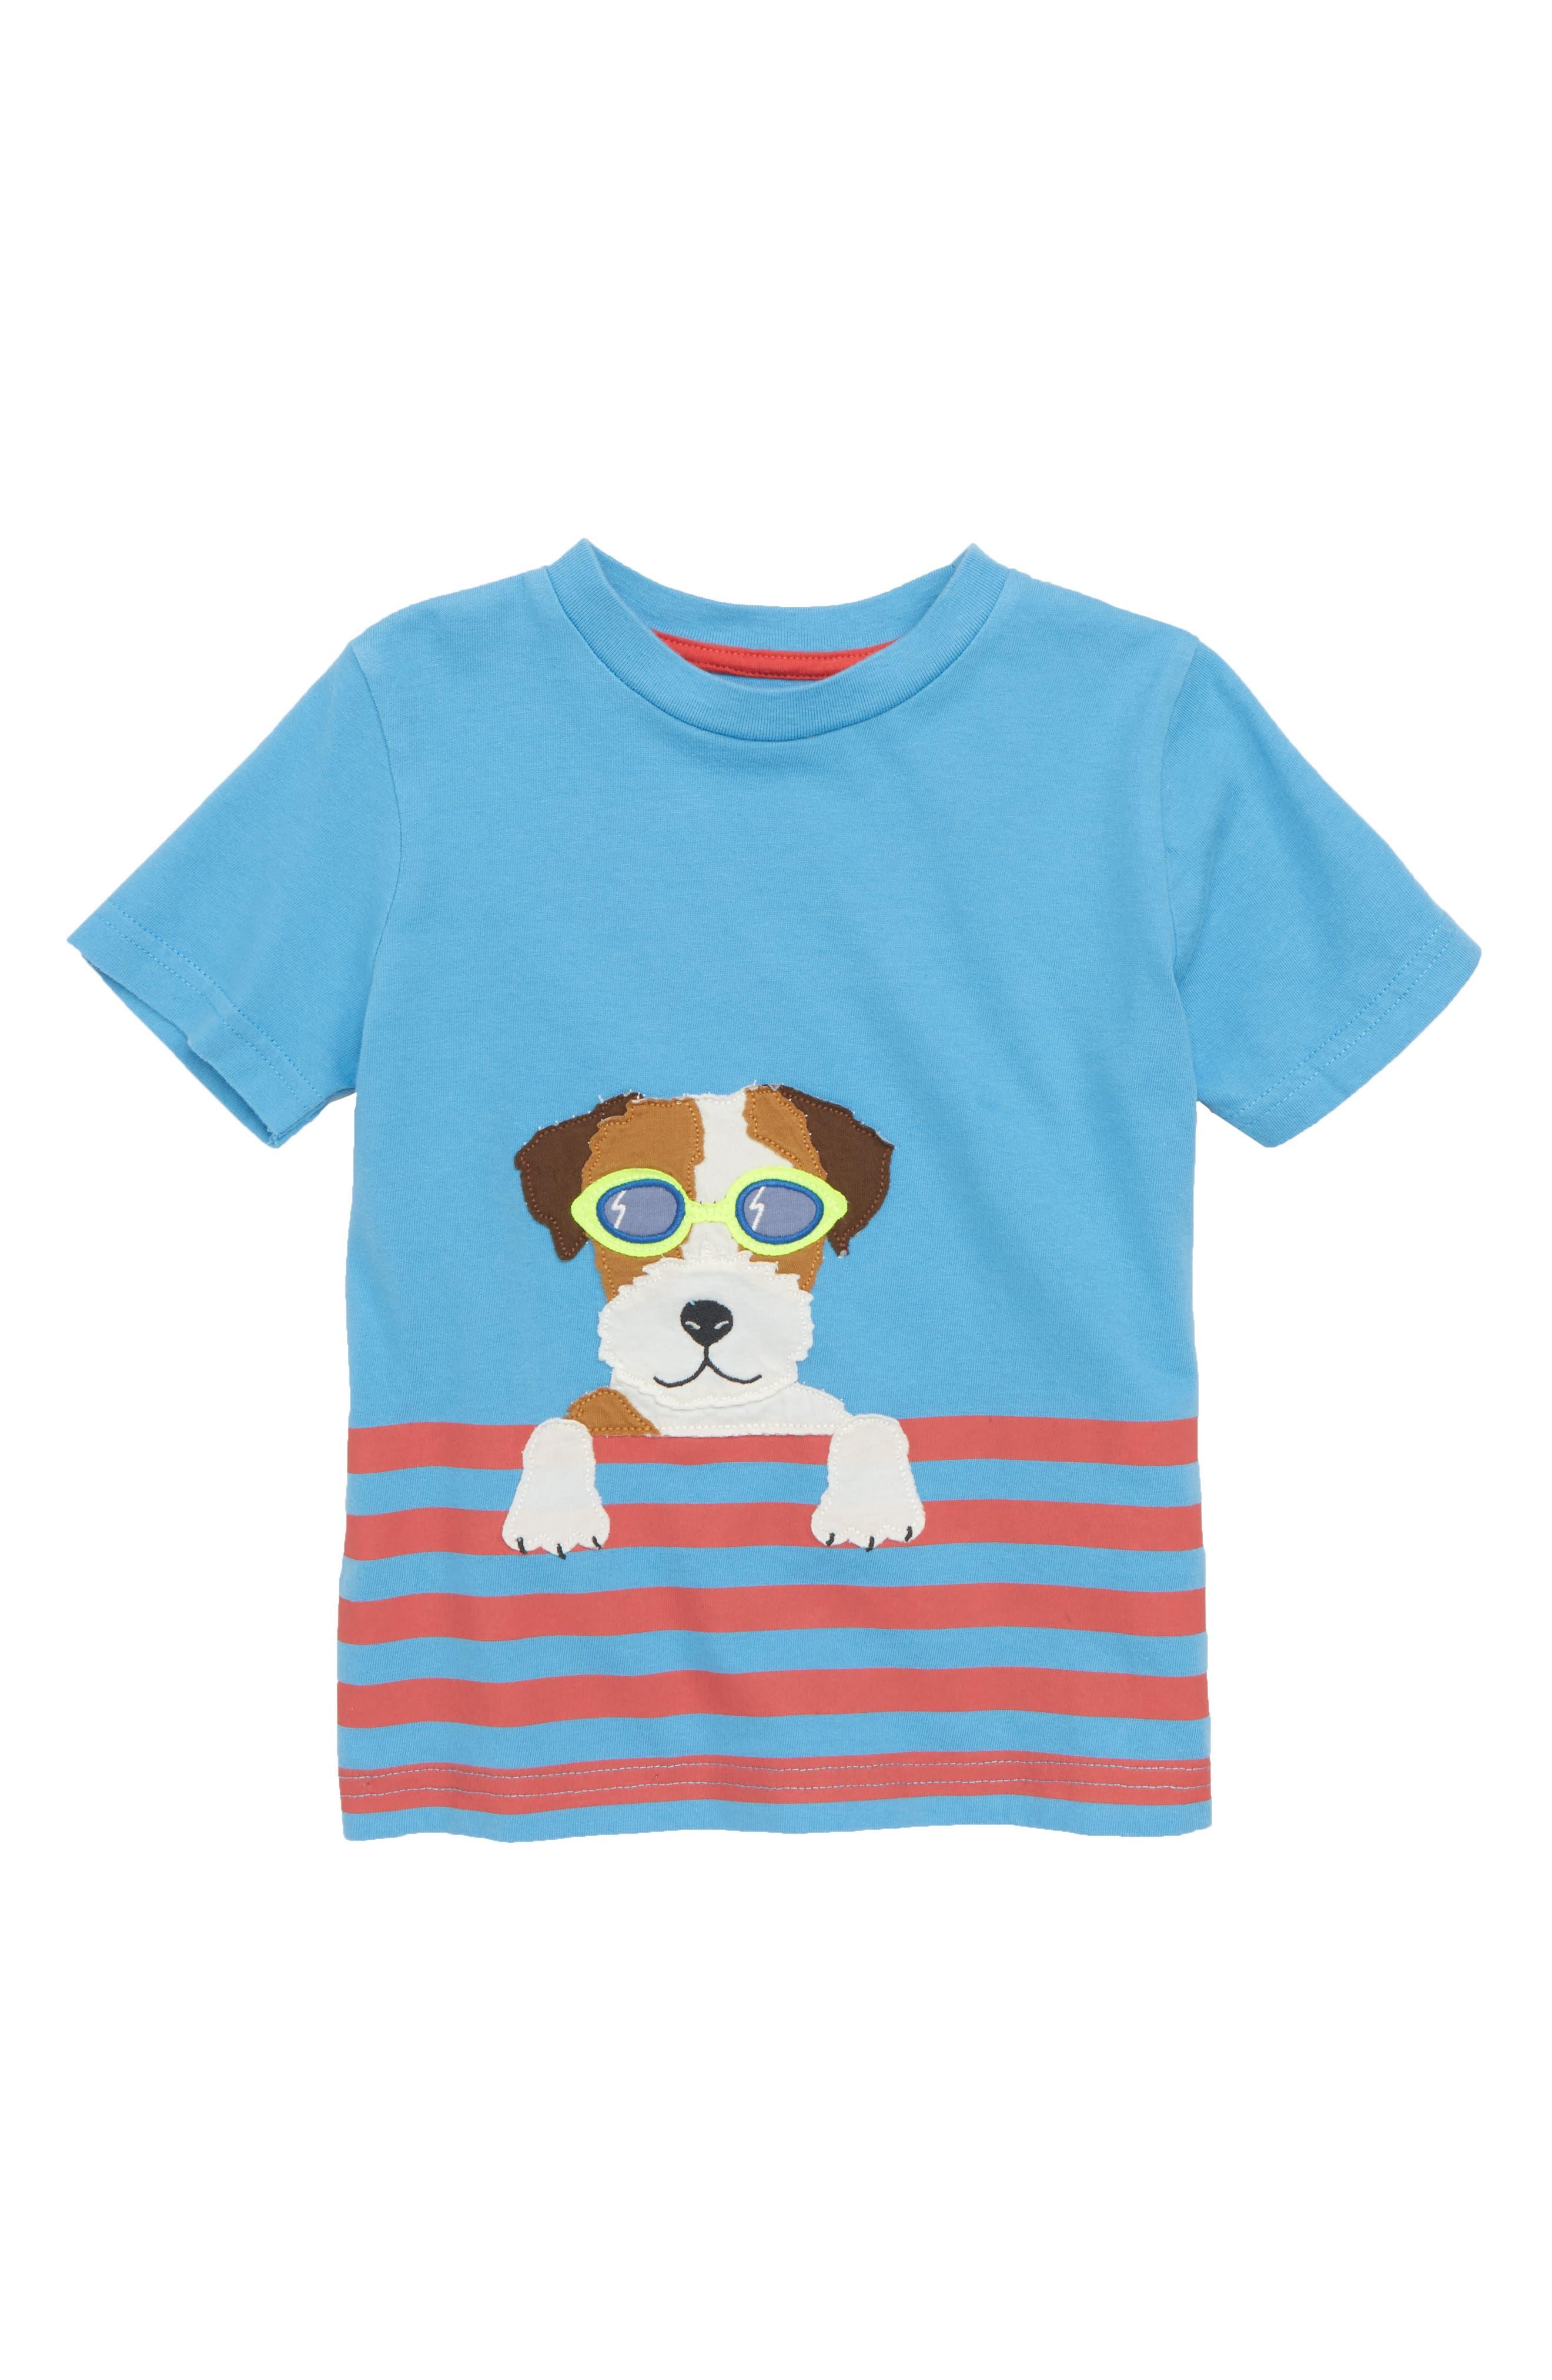 Paddling Pal Appliqué T-Shirt,                             Main thumbnail 1, color,                             Surfboard Blue Swimming Sprout